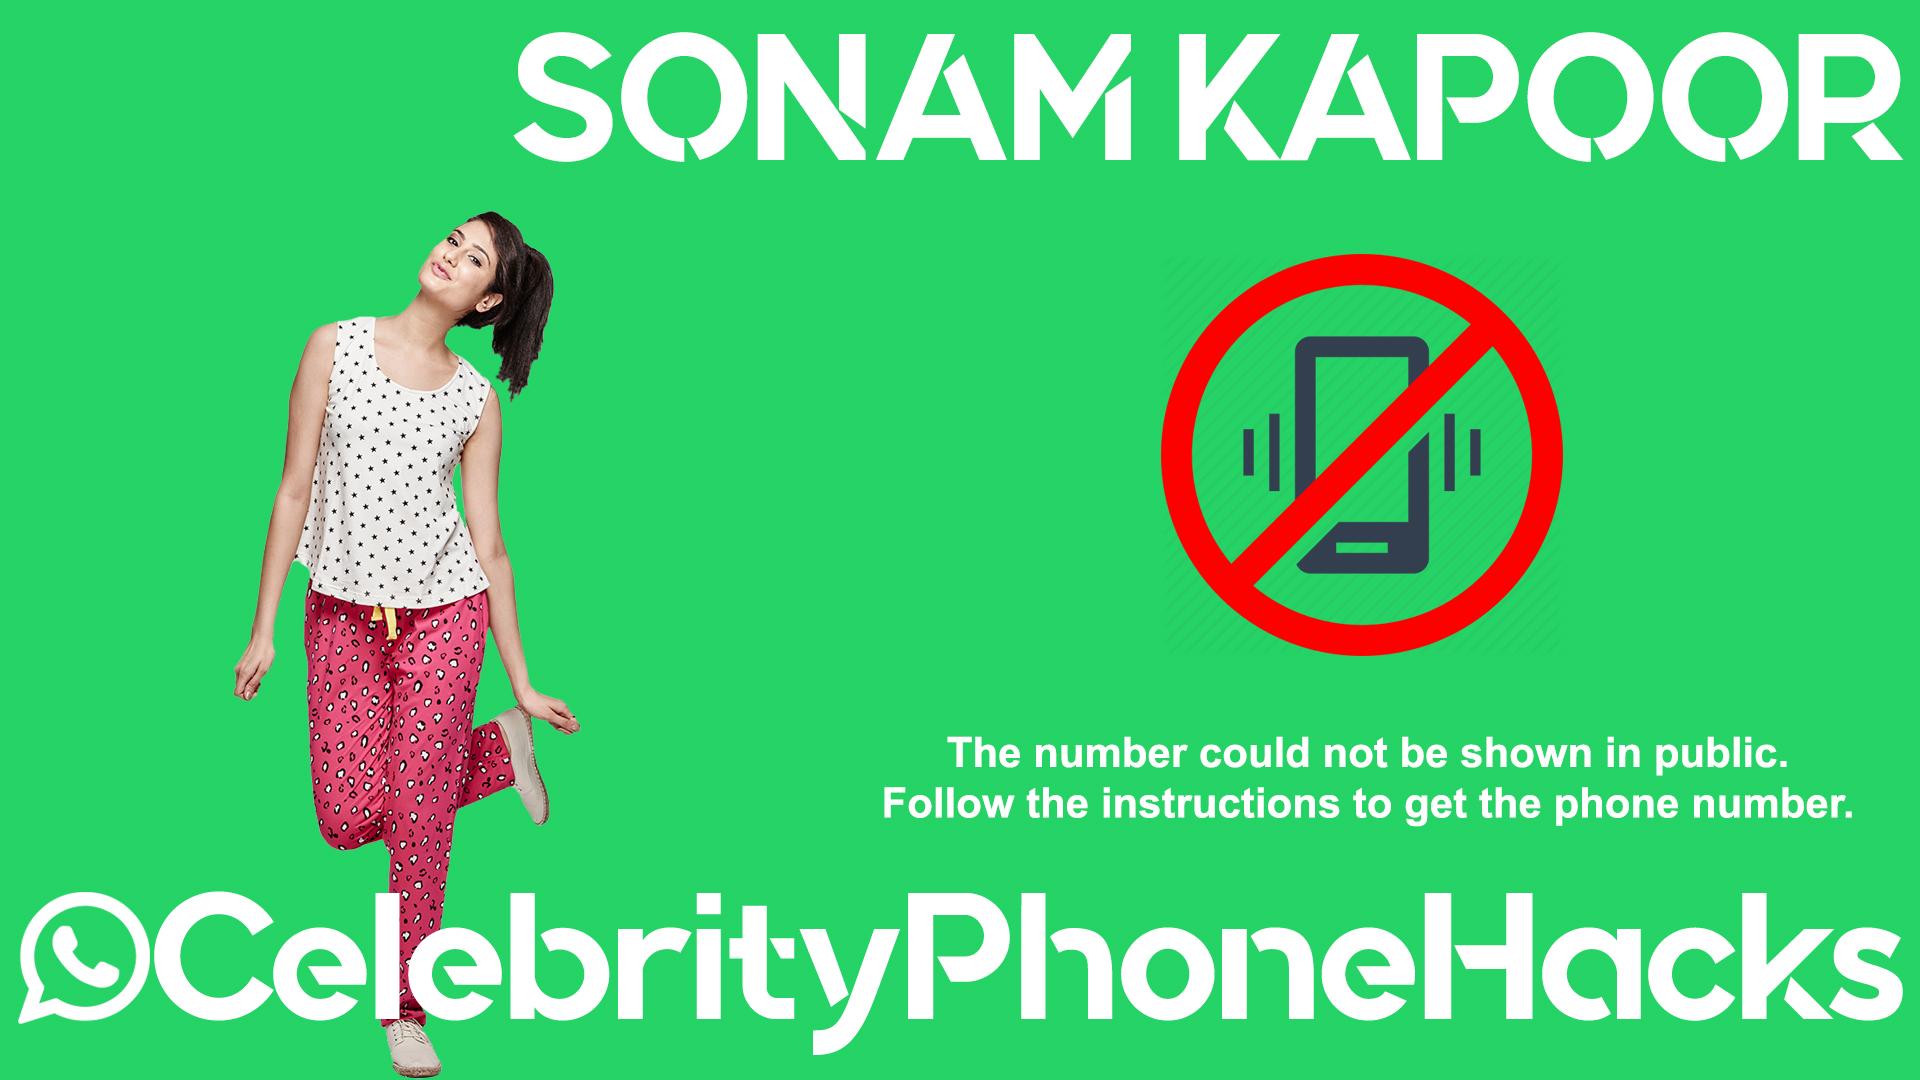 Sonam Kapoor real phone number 2019 whatsapp hacked leaked